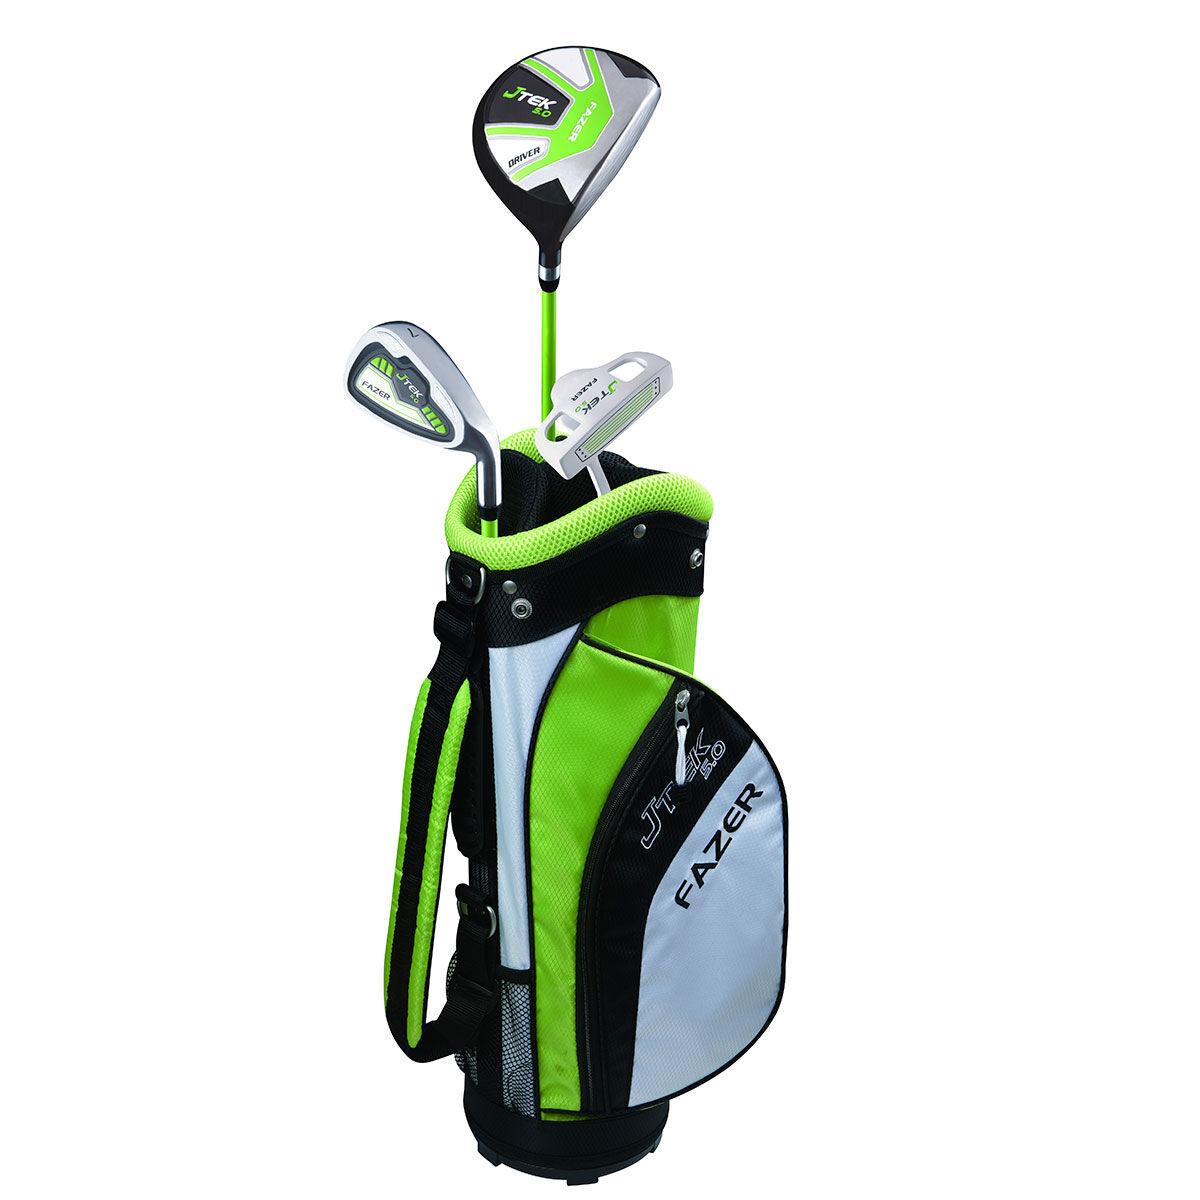 Fazer J TEK 5.0 Age 3-5 Junior Package Set, Unisex, Right Hand, Golf Stand Bag, Green